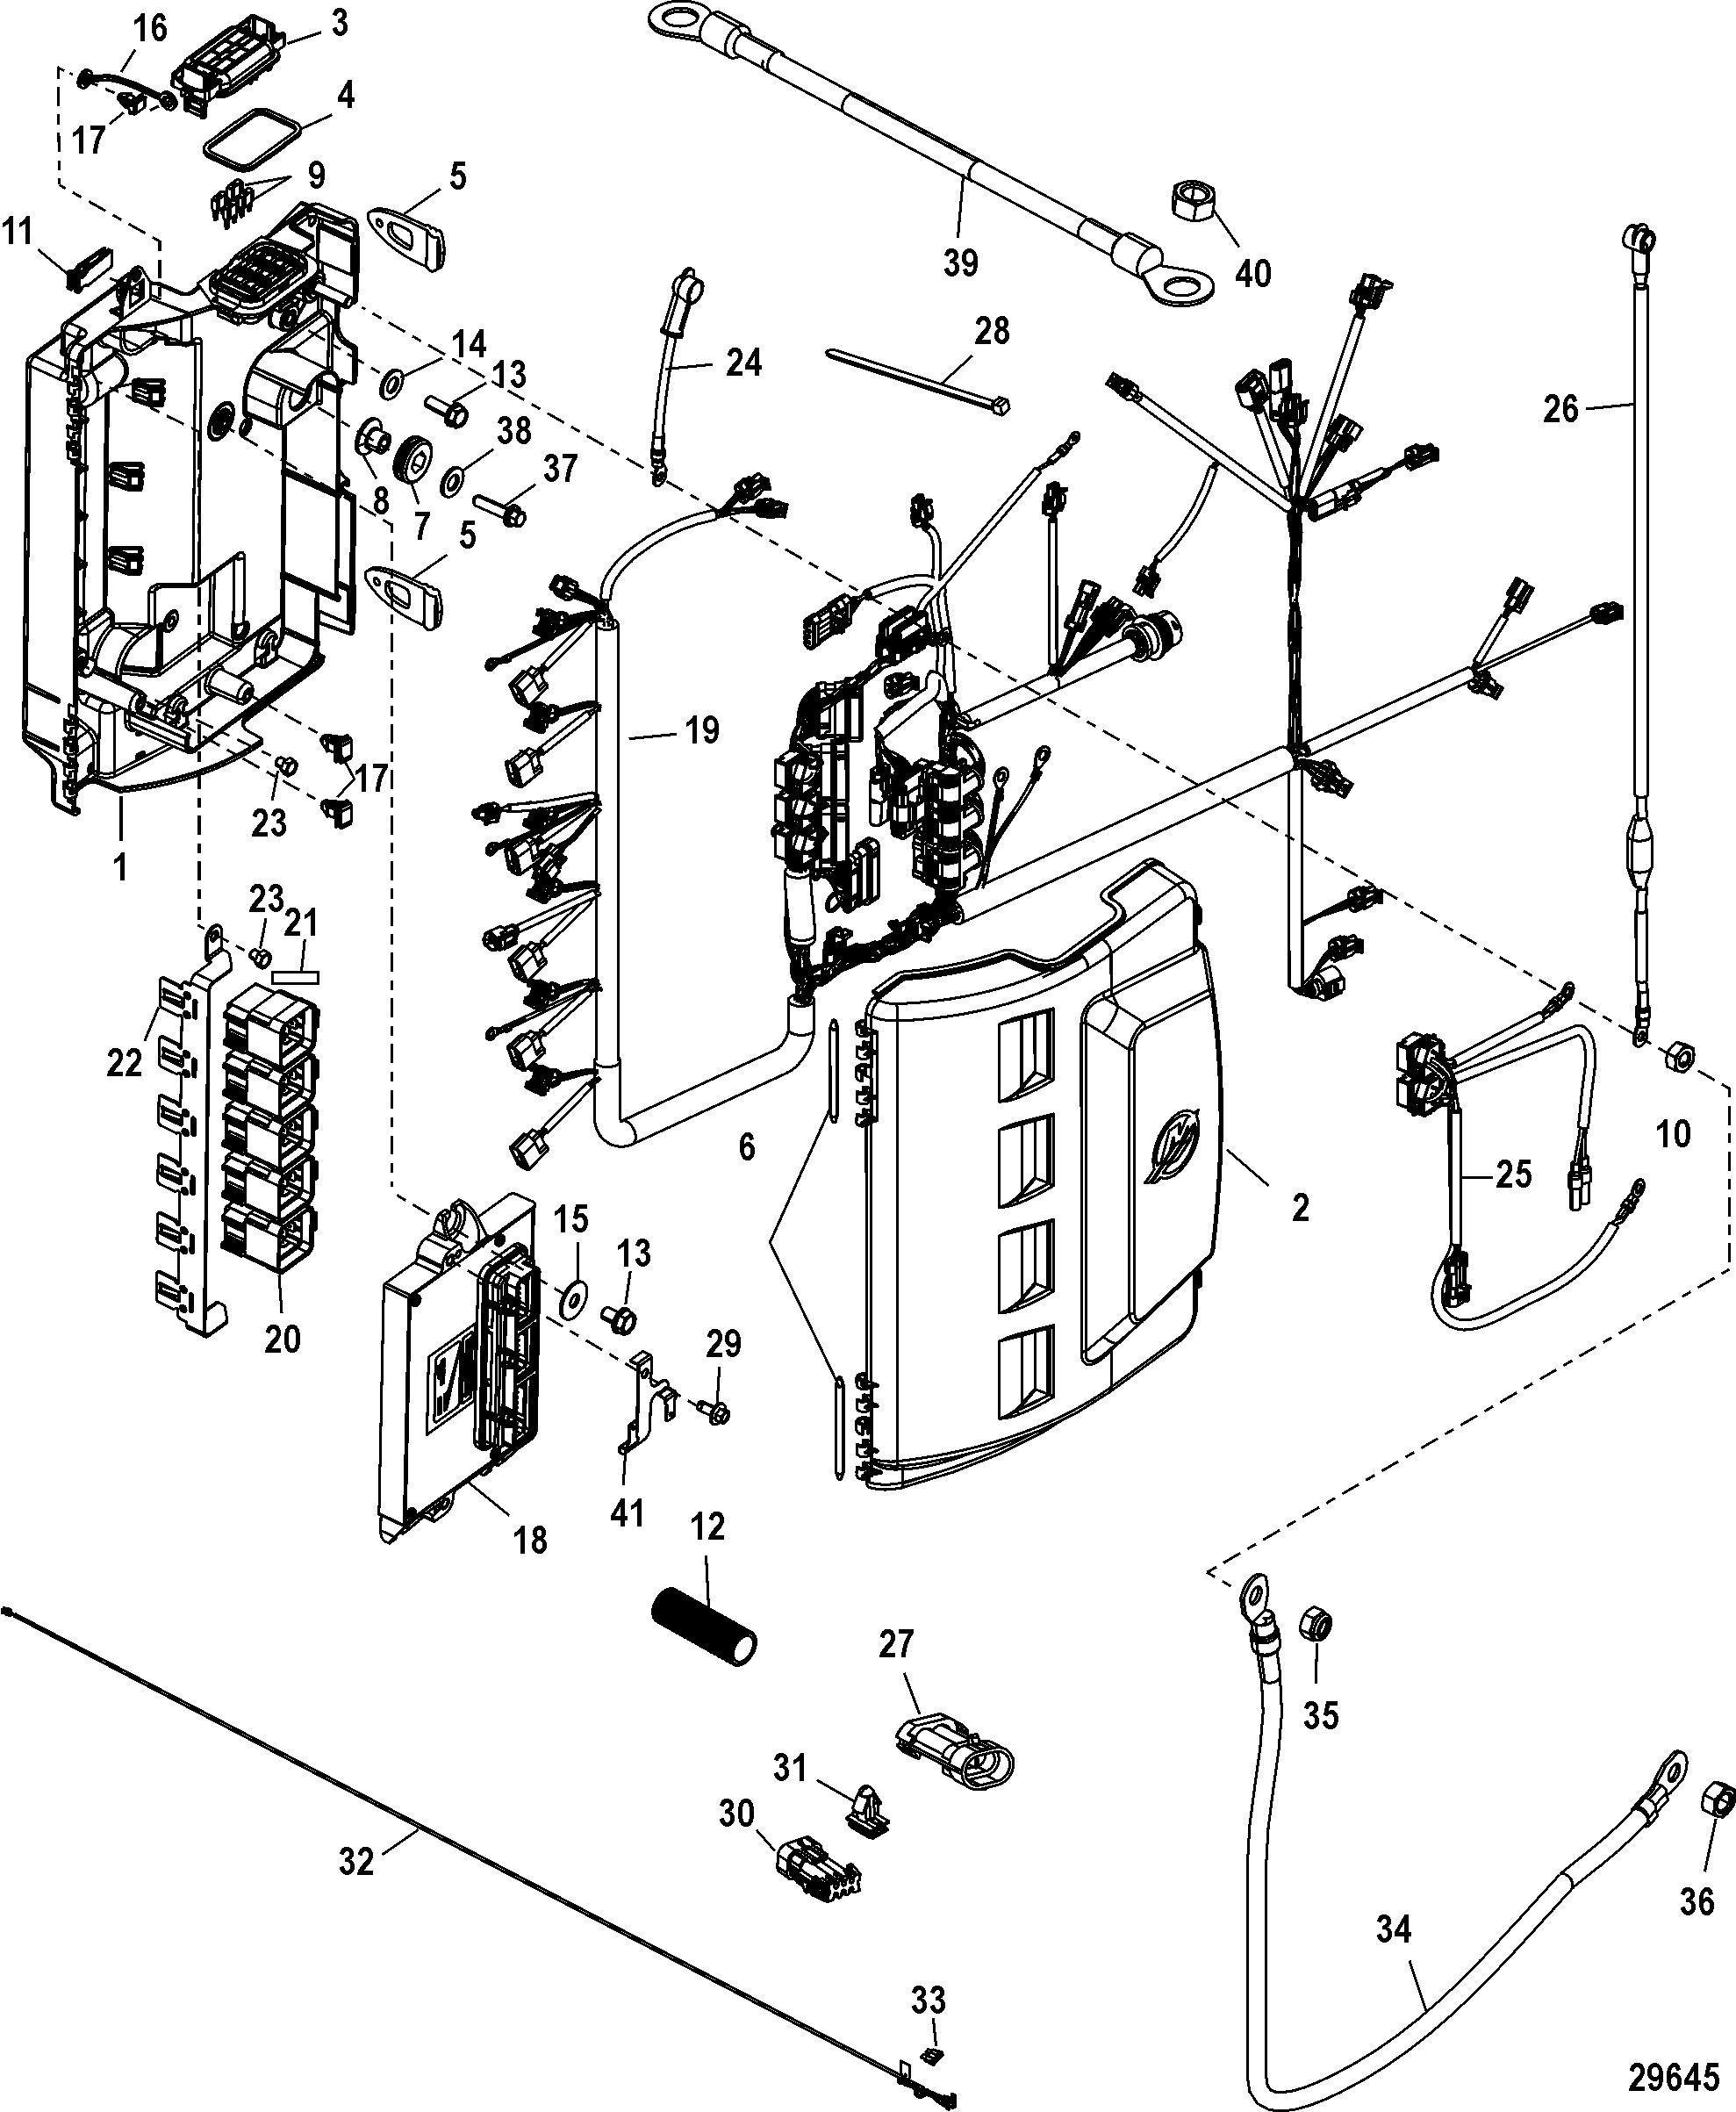 mercury verado 250 wiring diagram wiring diagram progresif rh 1 16 19 ertwq sandvik sps de